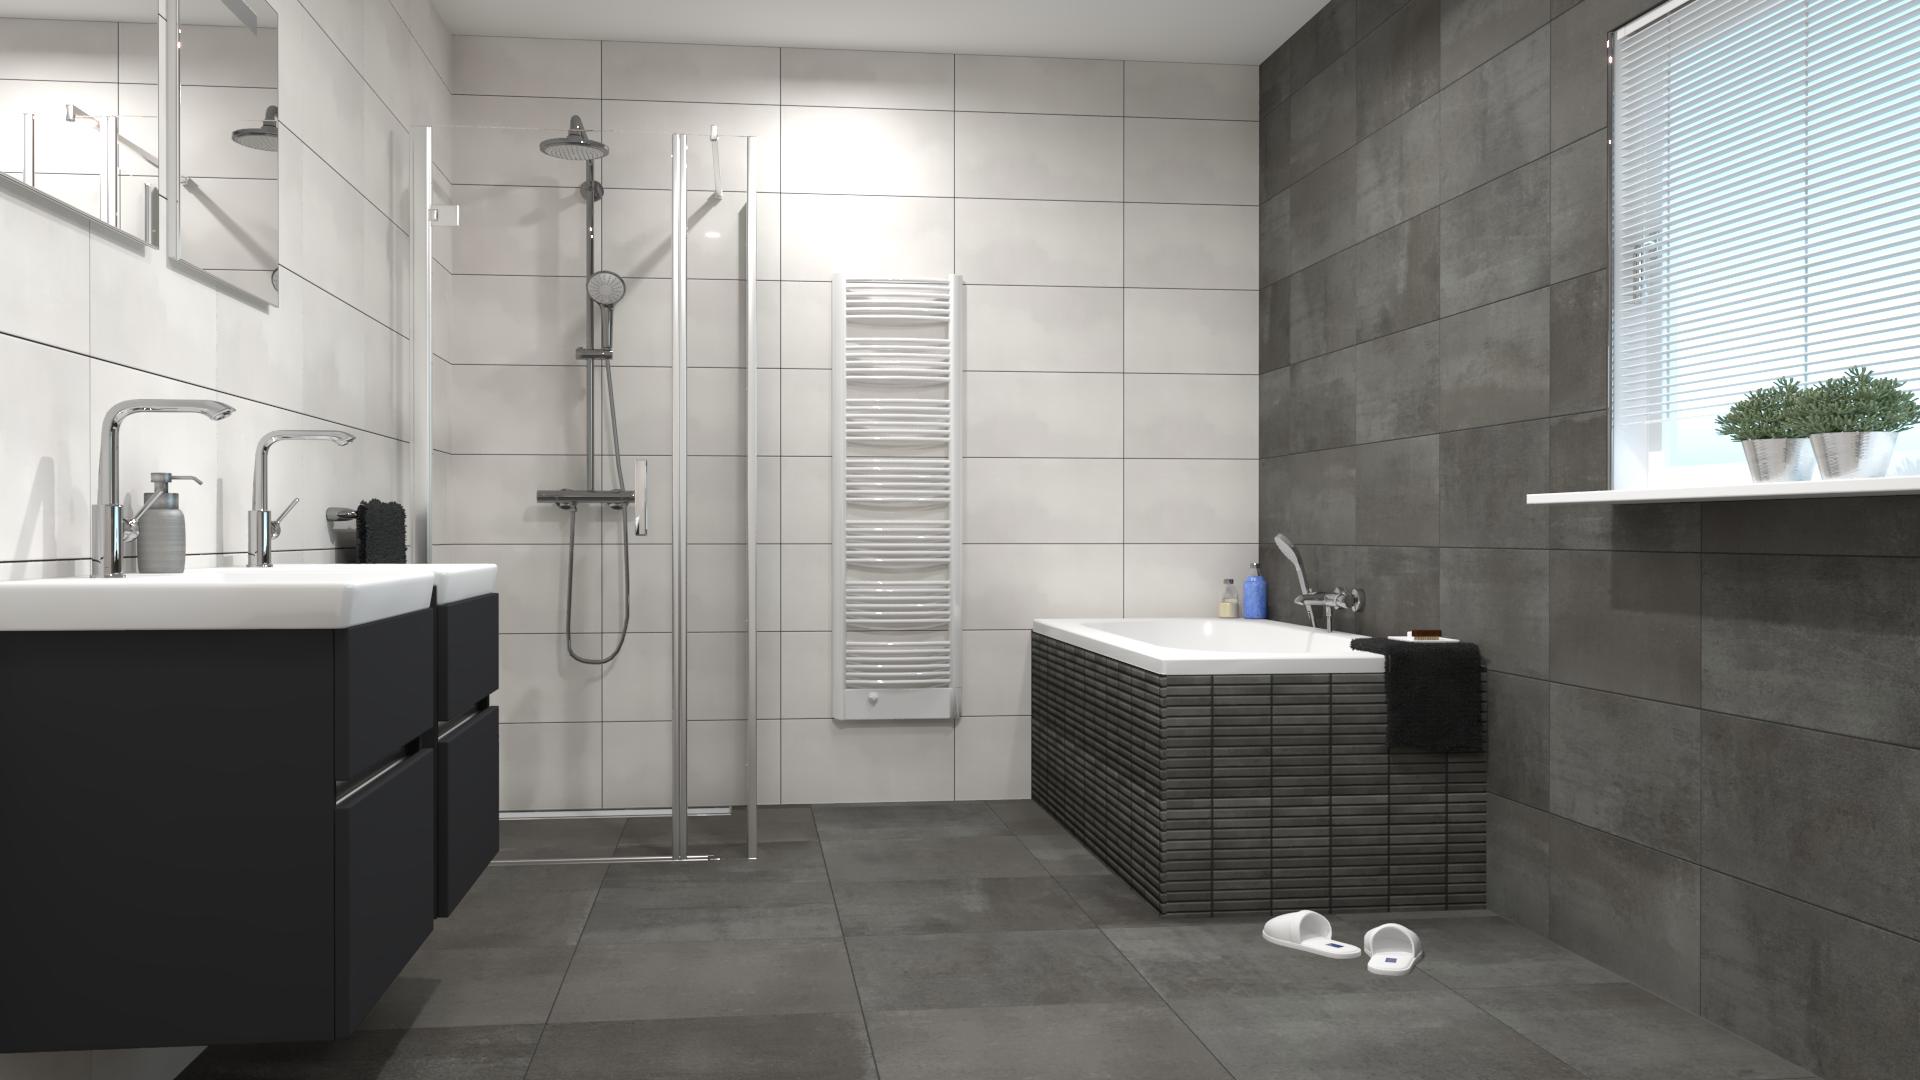 Spotlight Cm9m Van Villeroy Boch In De Formaten 60x60 En 30x60 Bath Tiles Villeroy Boch Bathtub